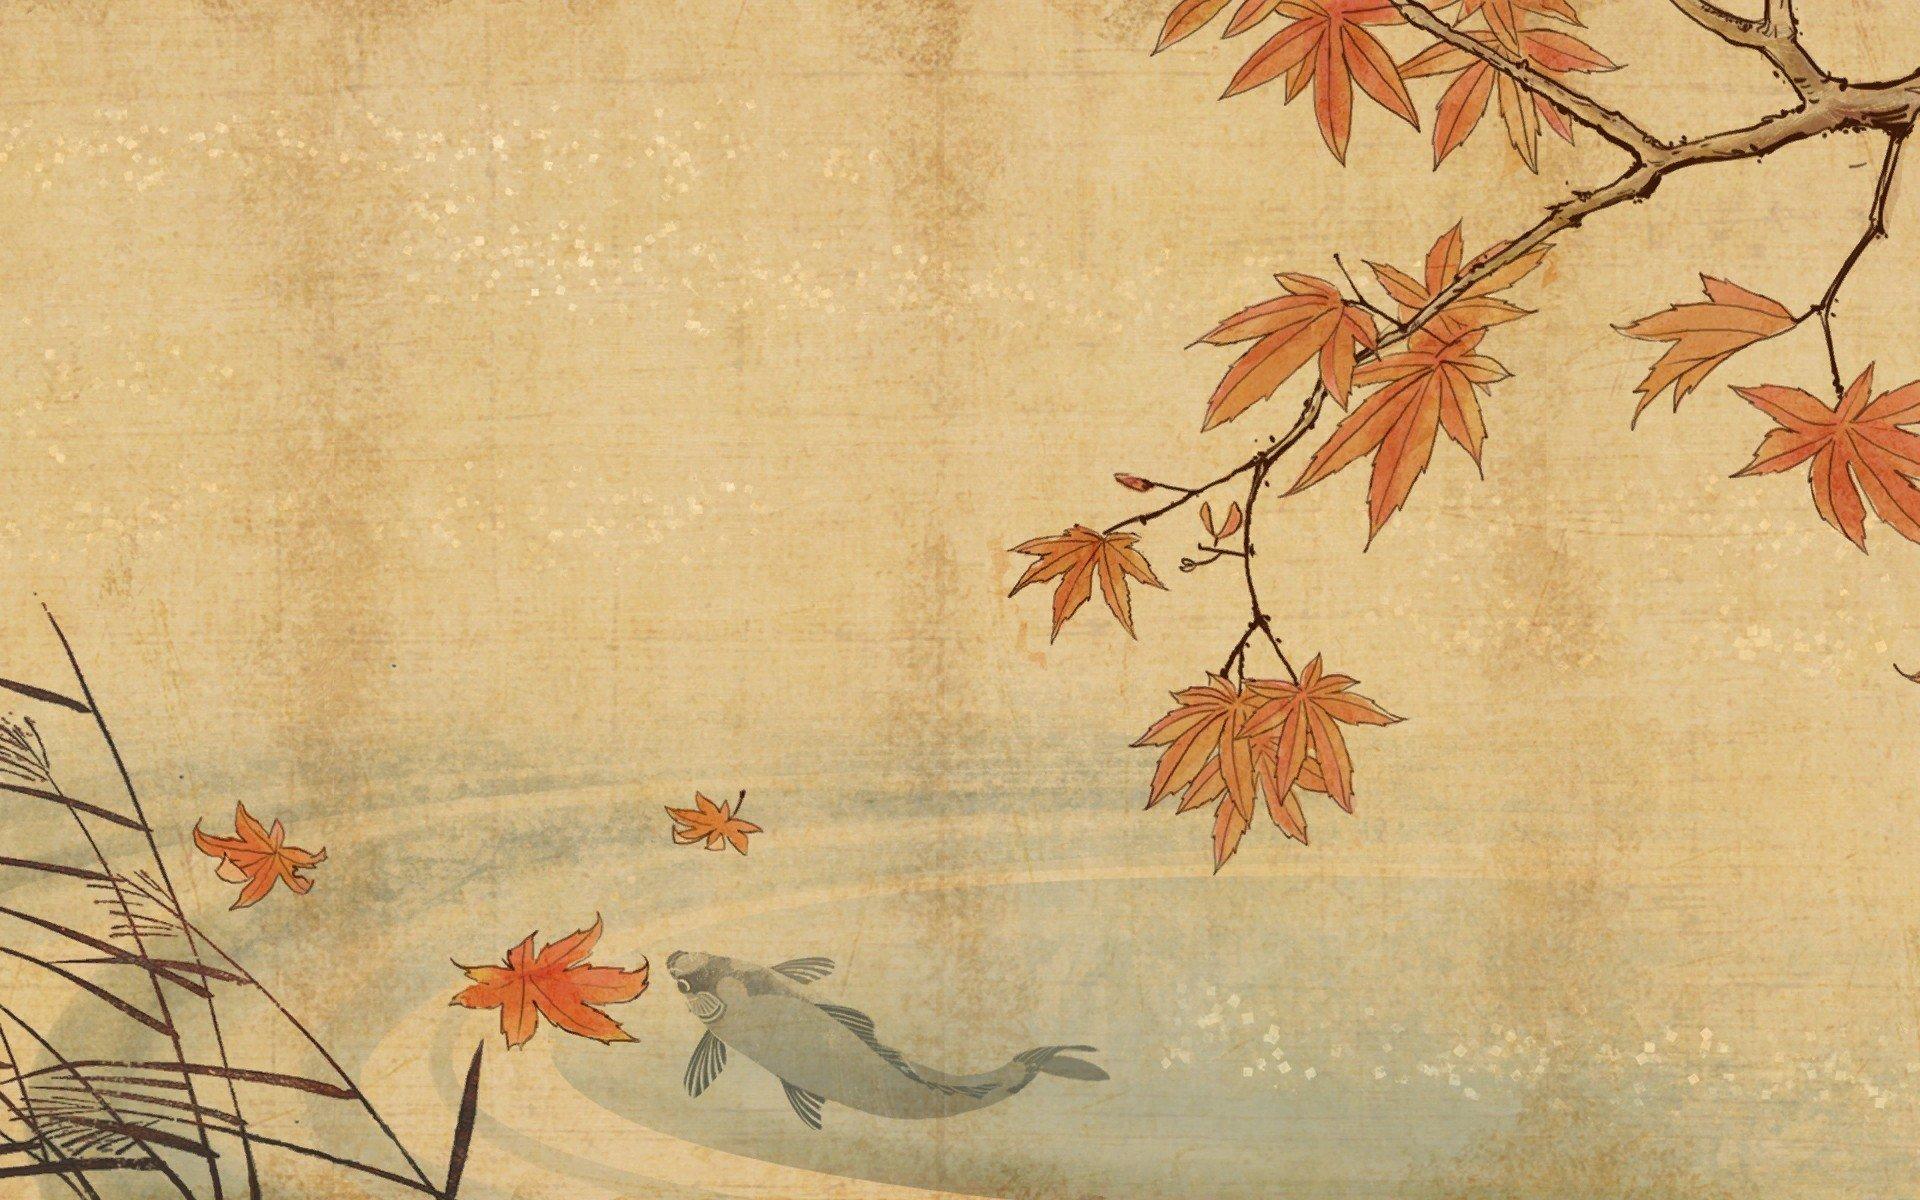 koi-fish-lake-water-leaf-autumn